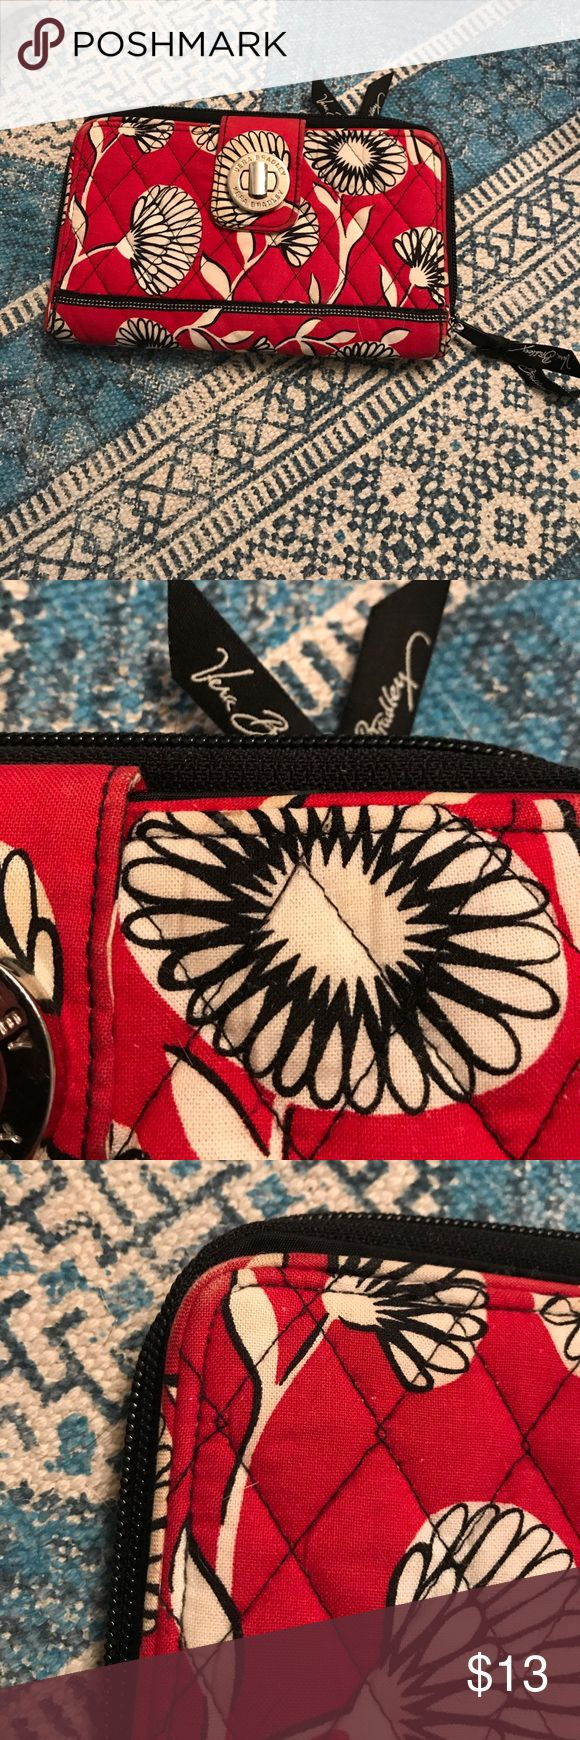 Selling this Vera Bradley wallet on Poshmark! My username is: thomiesimmons. #shopmycloset #poshmark #fashion #shopping #style #forsale #Vera Bradley #Handbags